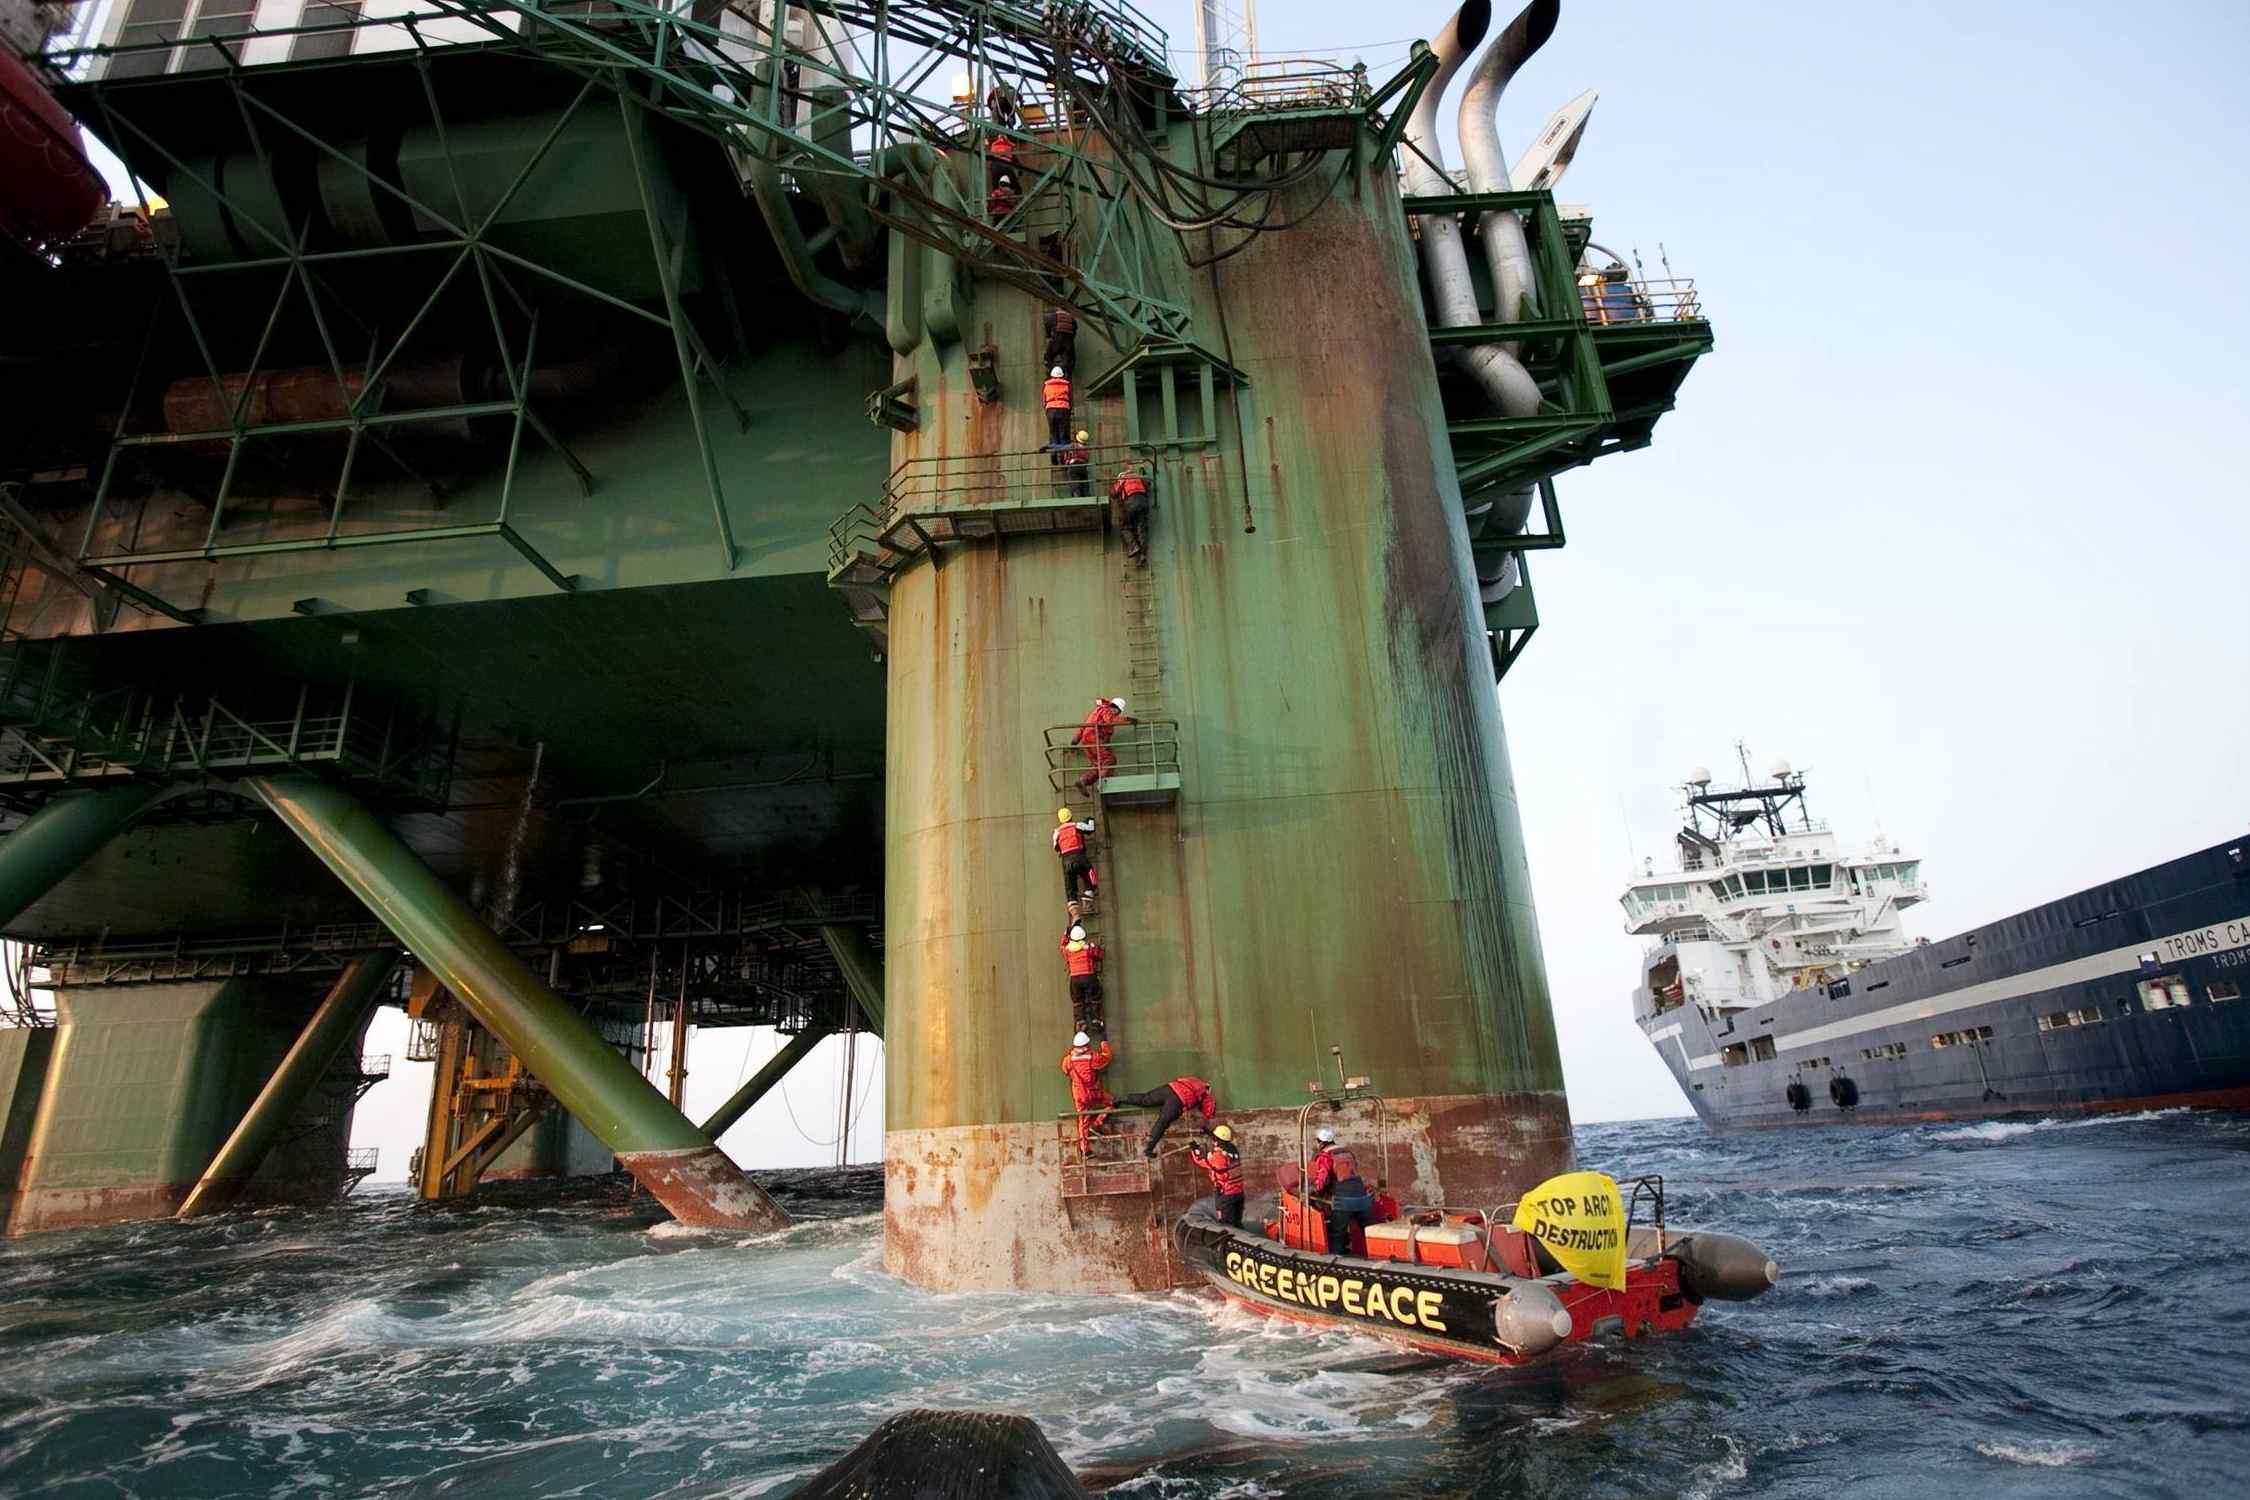 greenpeace-oil-rig_greenpeace